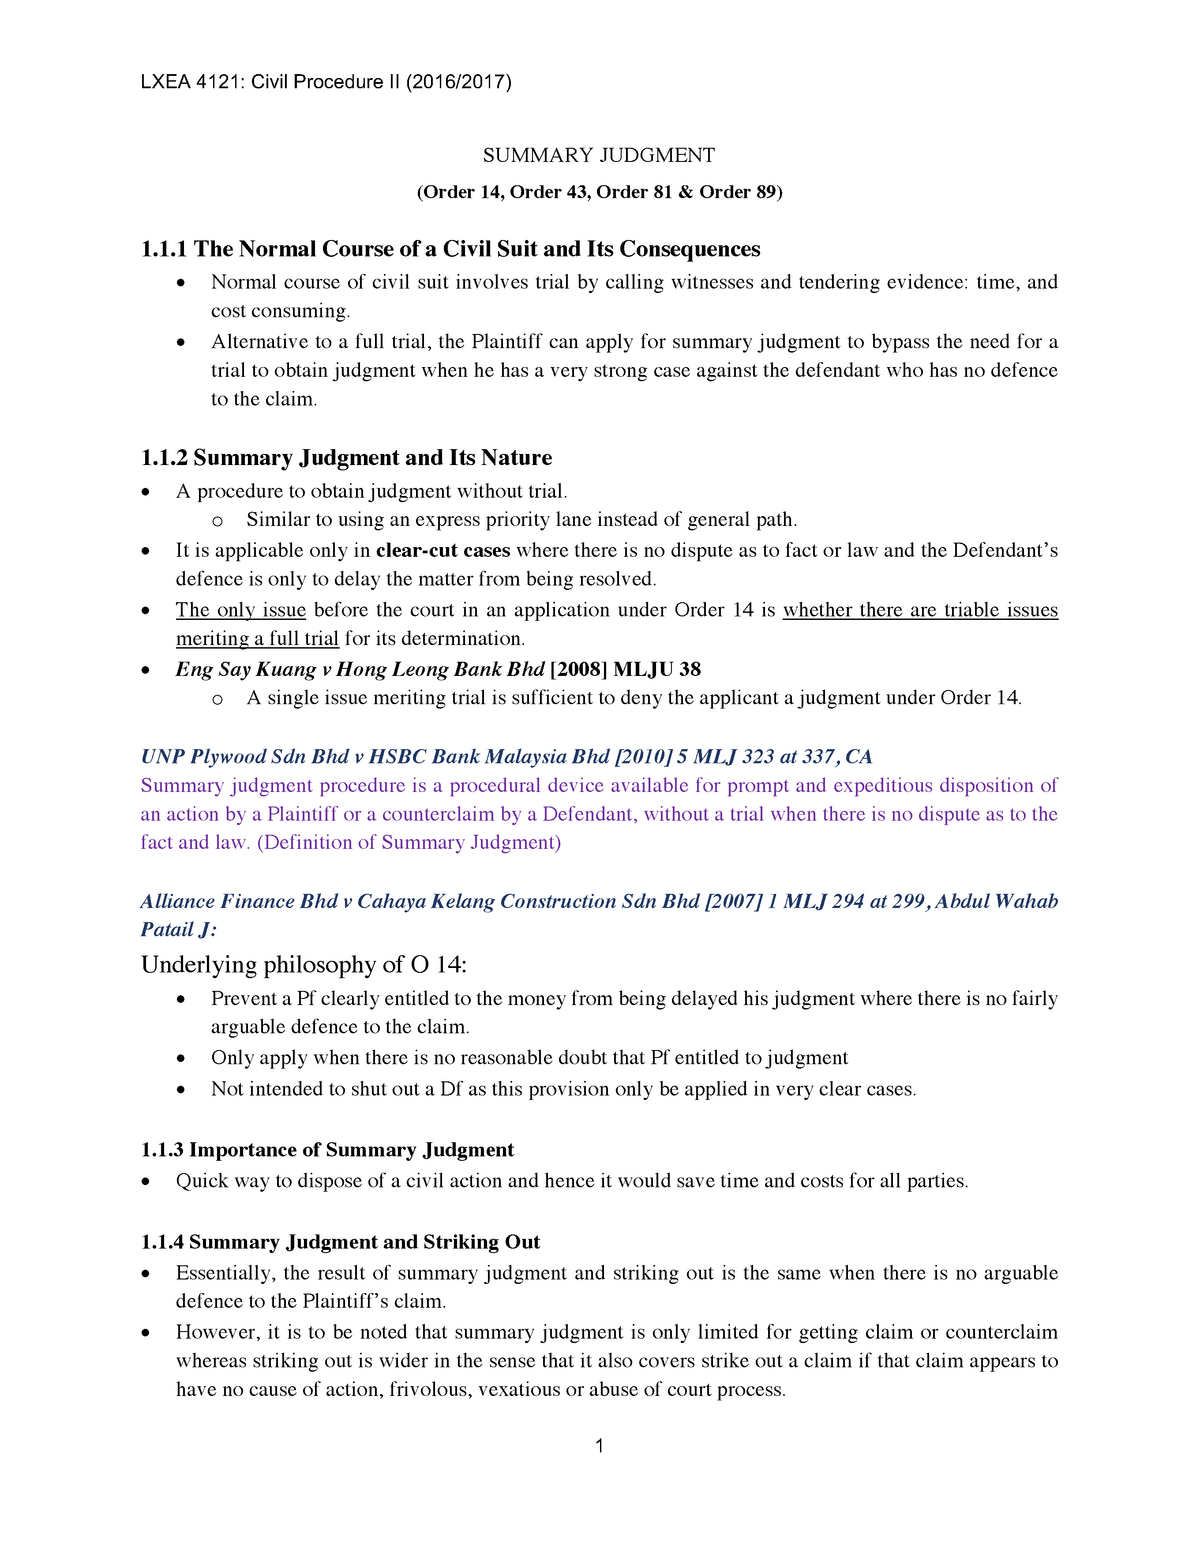 Civil Procedure Sem 2 - Lecture notes Notes for whole